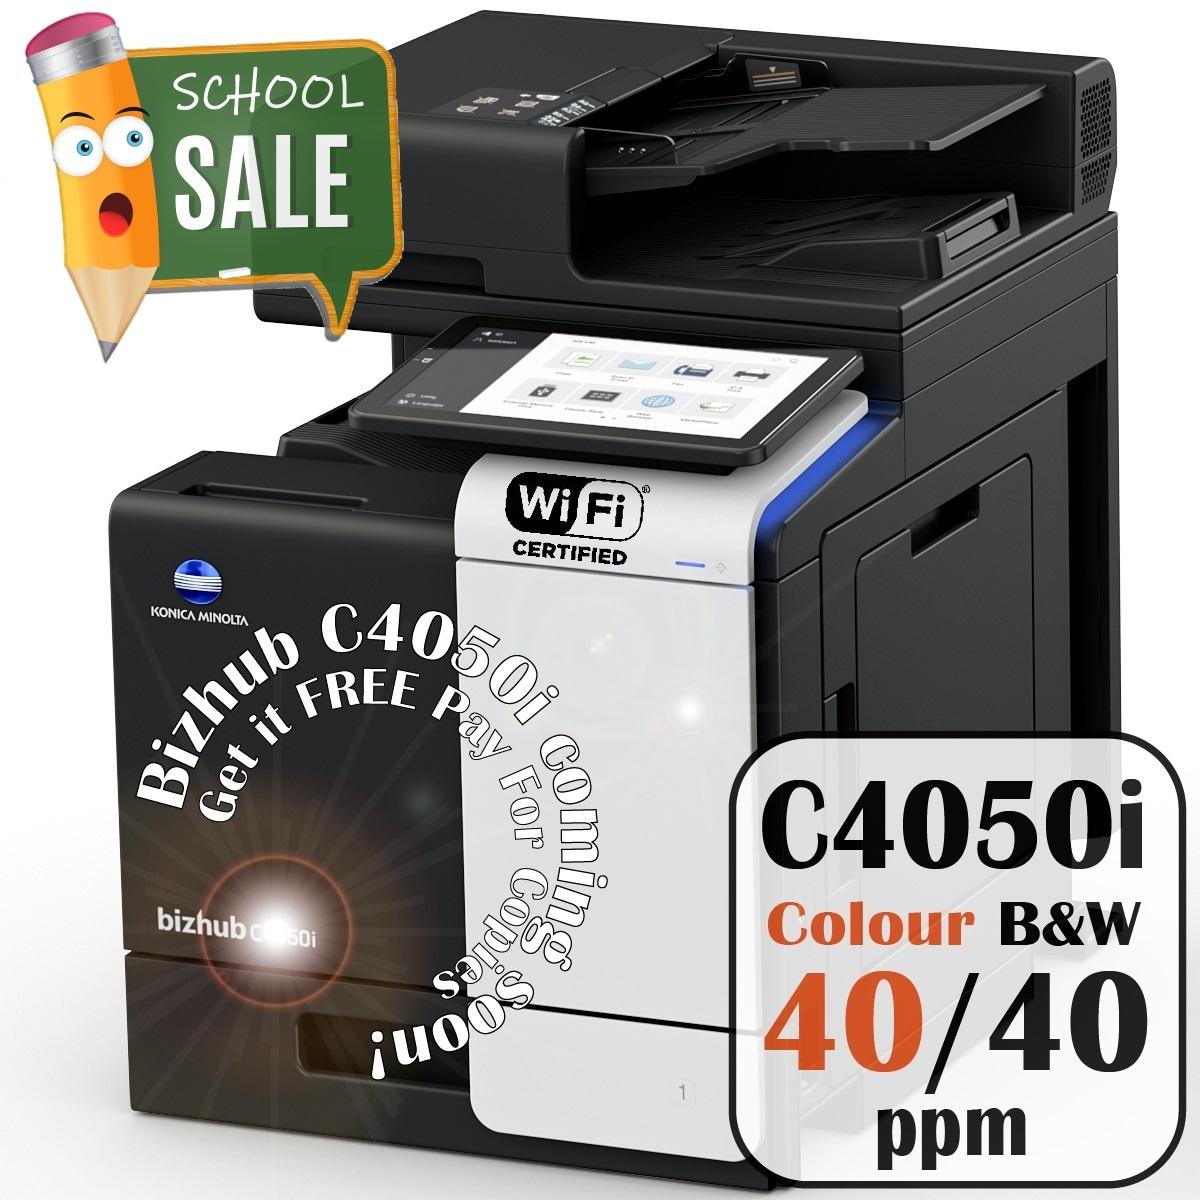 Konica Minolta Bizhub C4050i Colour Copier Printer Rental Price Offers